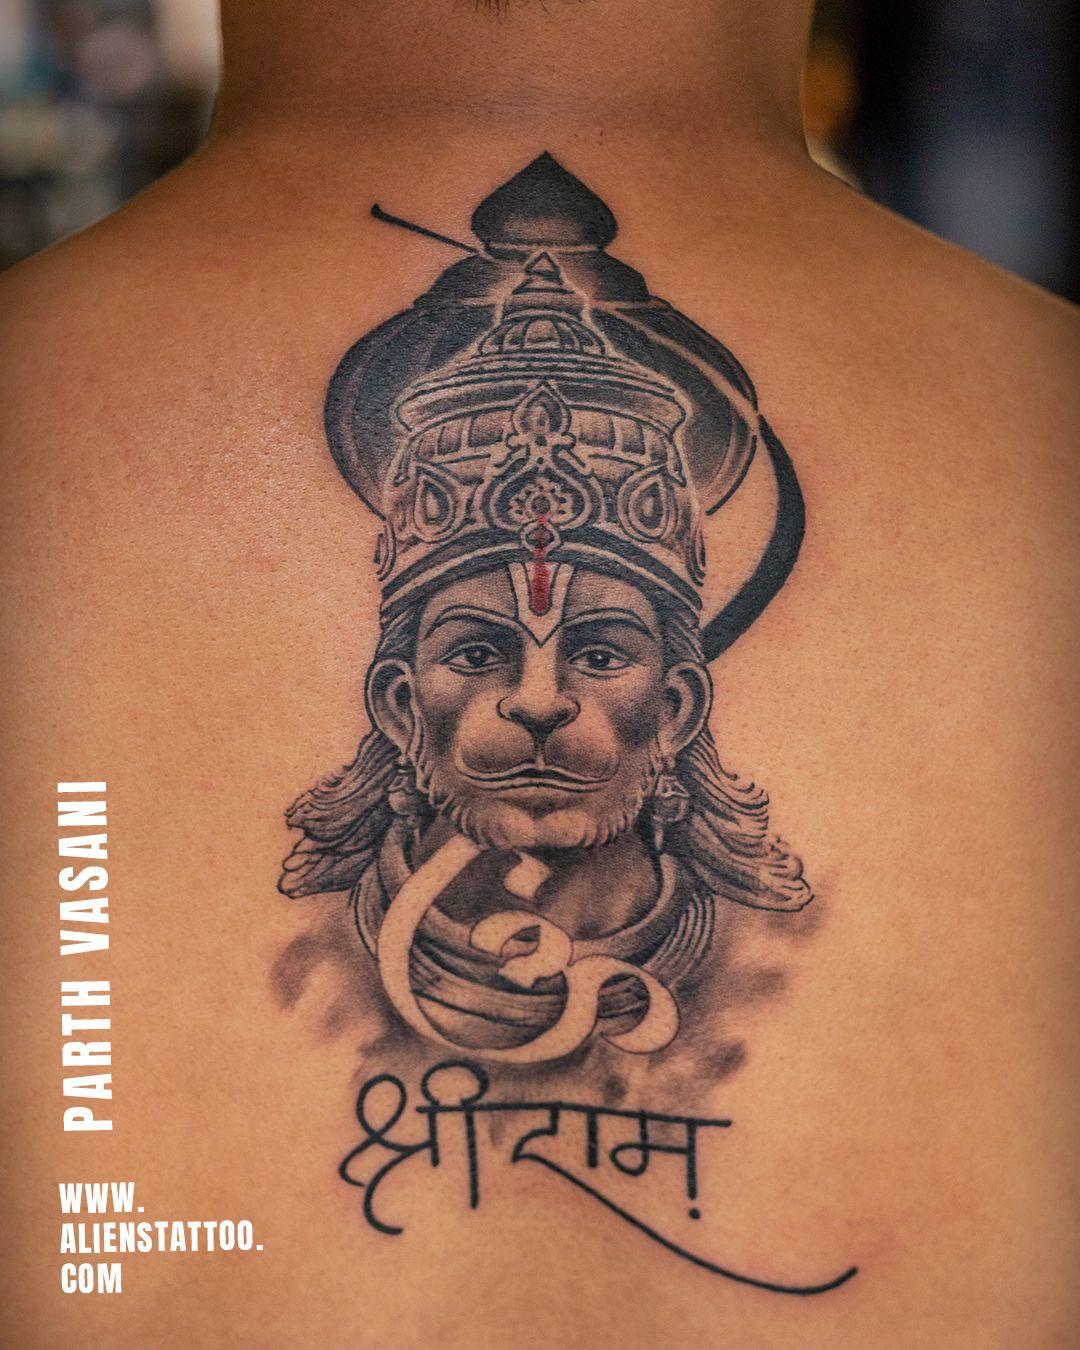 Realistic Hanuman Tattoo By Parth Vasani At Aliens Tattoo India Hanuman Tattoo Shiva Tattoo Design Krishna Tattoo Hanuman tattoo hd wallpaper